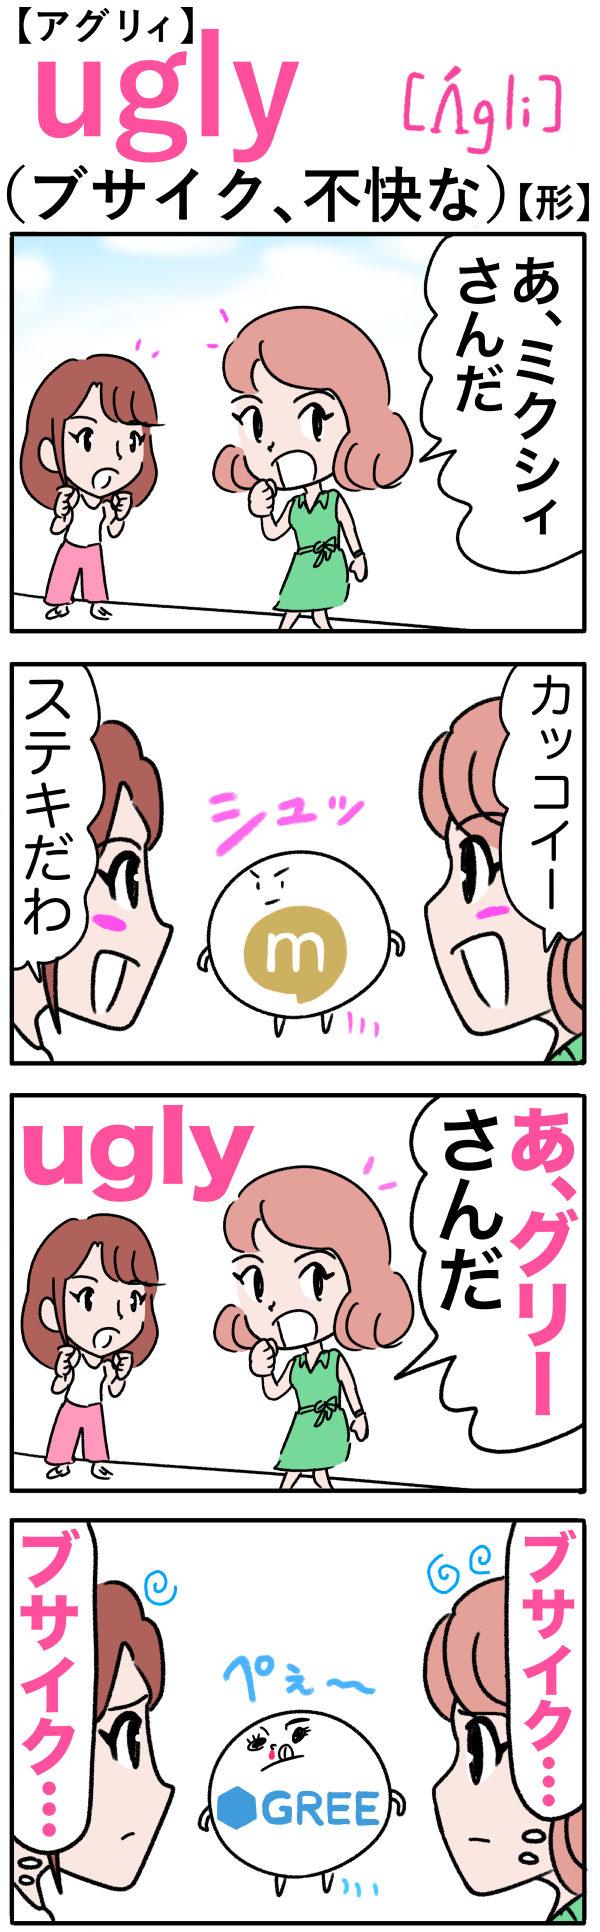 ugly(ブサイク、不快な)の語呂合わせ英単語